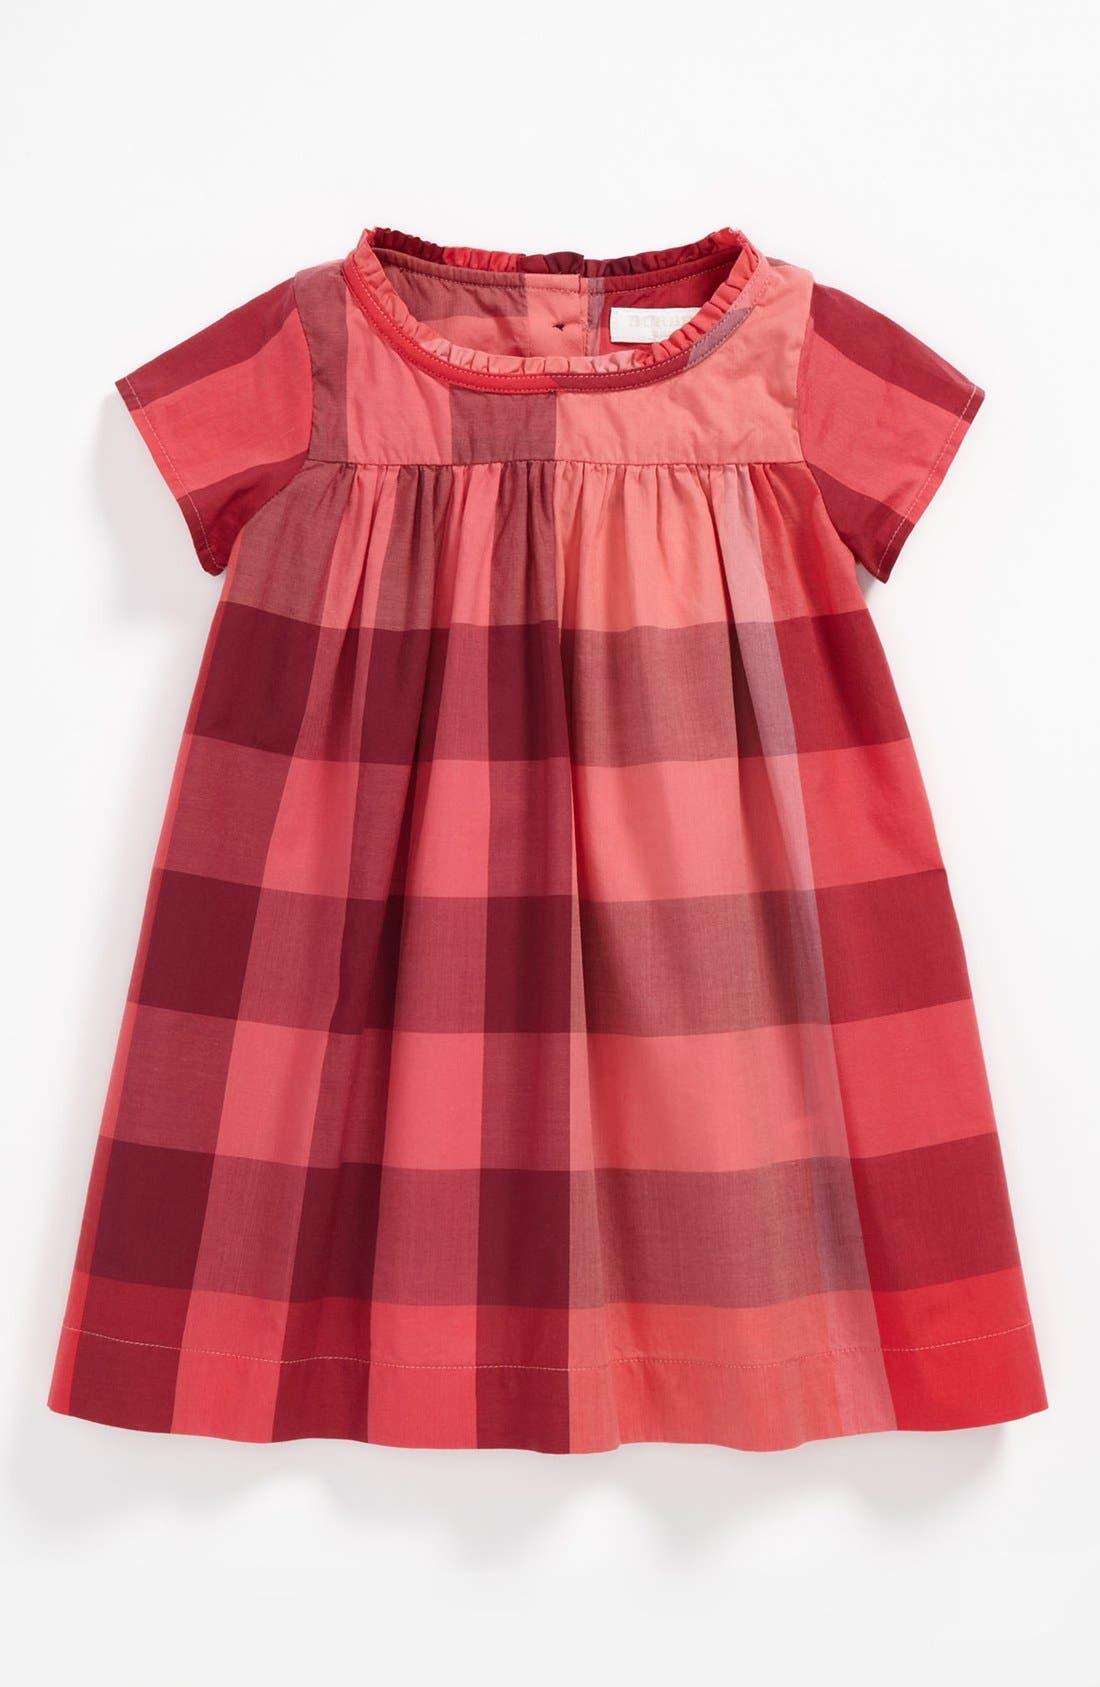 Main Image - Burberry 'Delia' Dress (Baby)